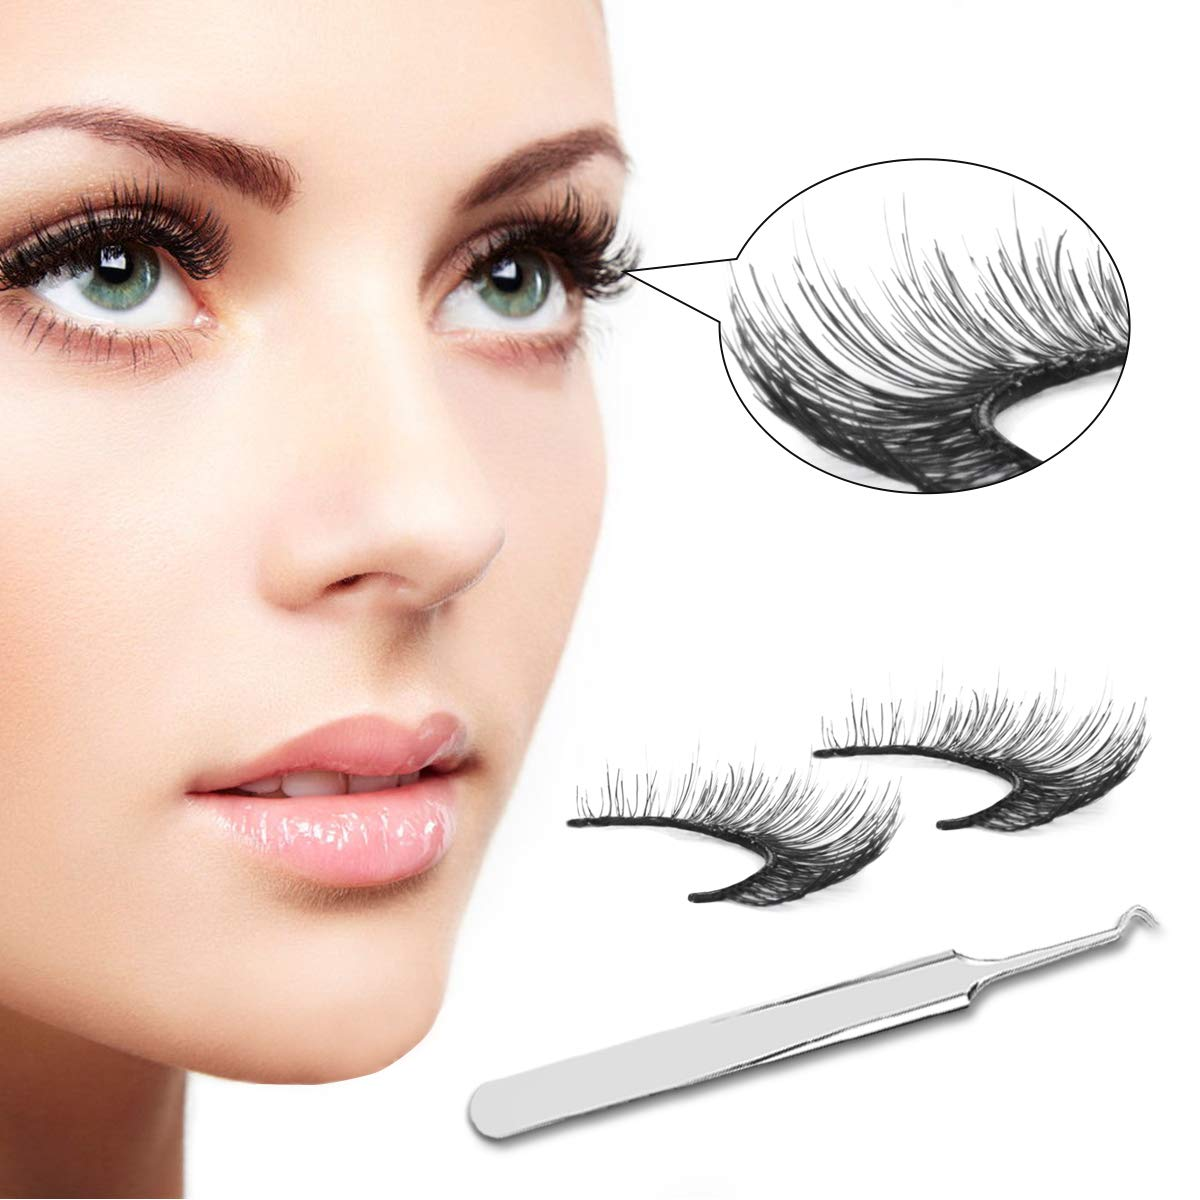 bb85aafbb75 Amazon.com : Self-Adhesive False Eyelashes Pack,FYPO Glue-free Fake  Eyelashes Set with Tape for Women, 3D Eyelashes Extension with Remover Clip  Tweezers ...